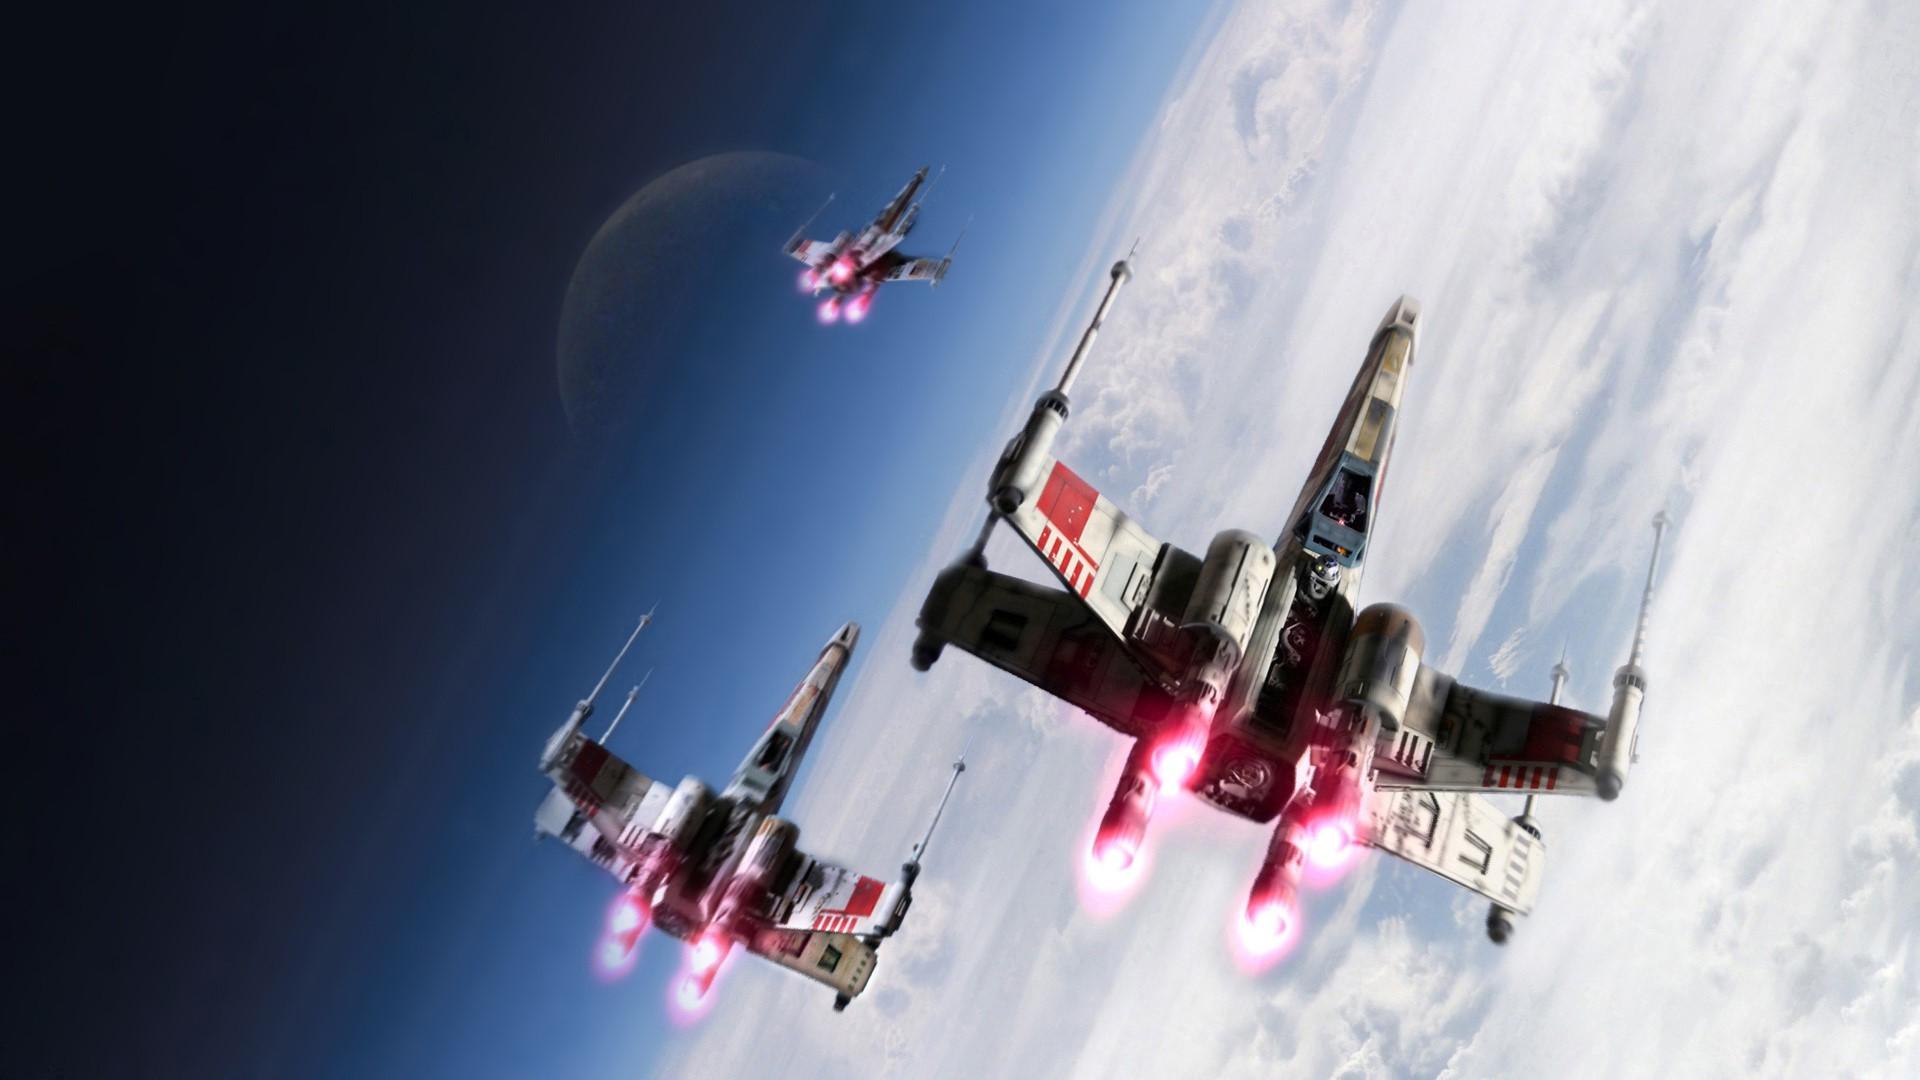 Wallpaper Star Wars Space Sky Snowboarding Snowboard